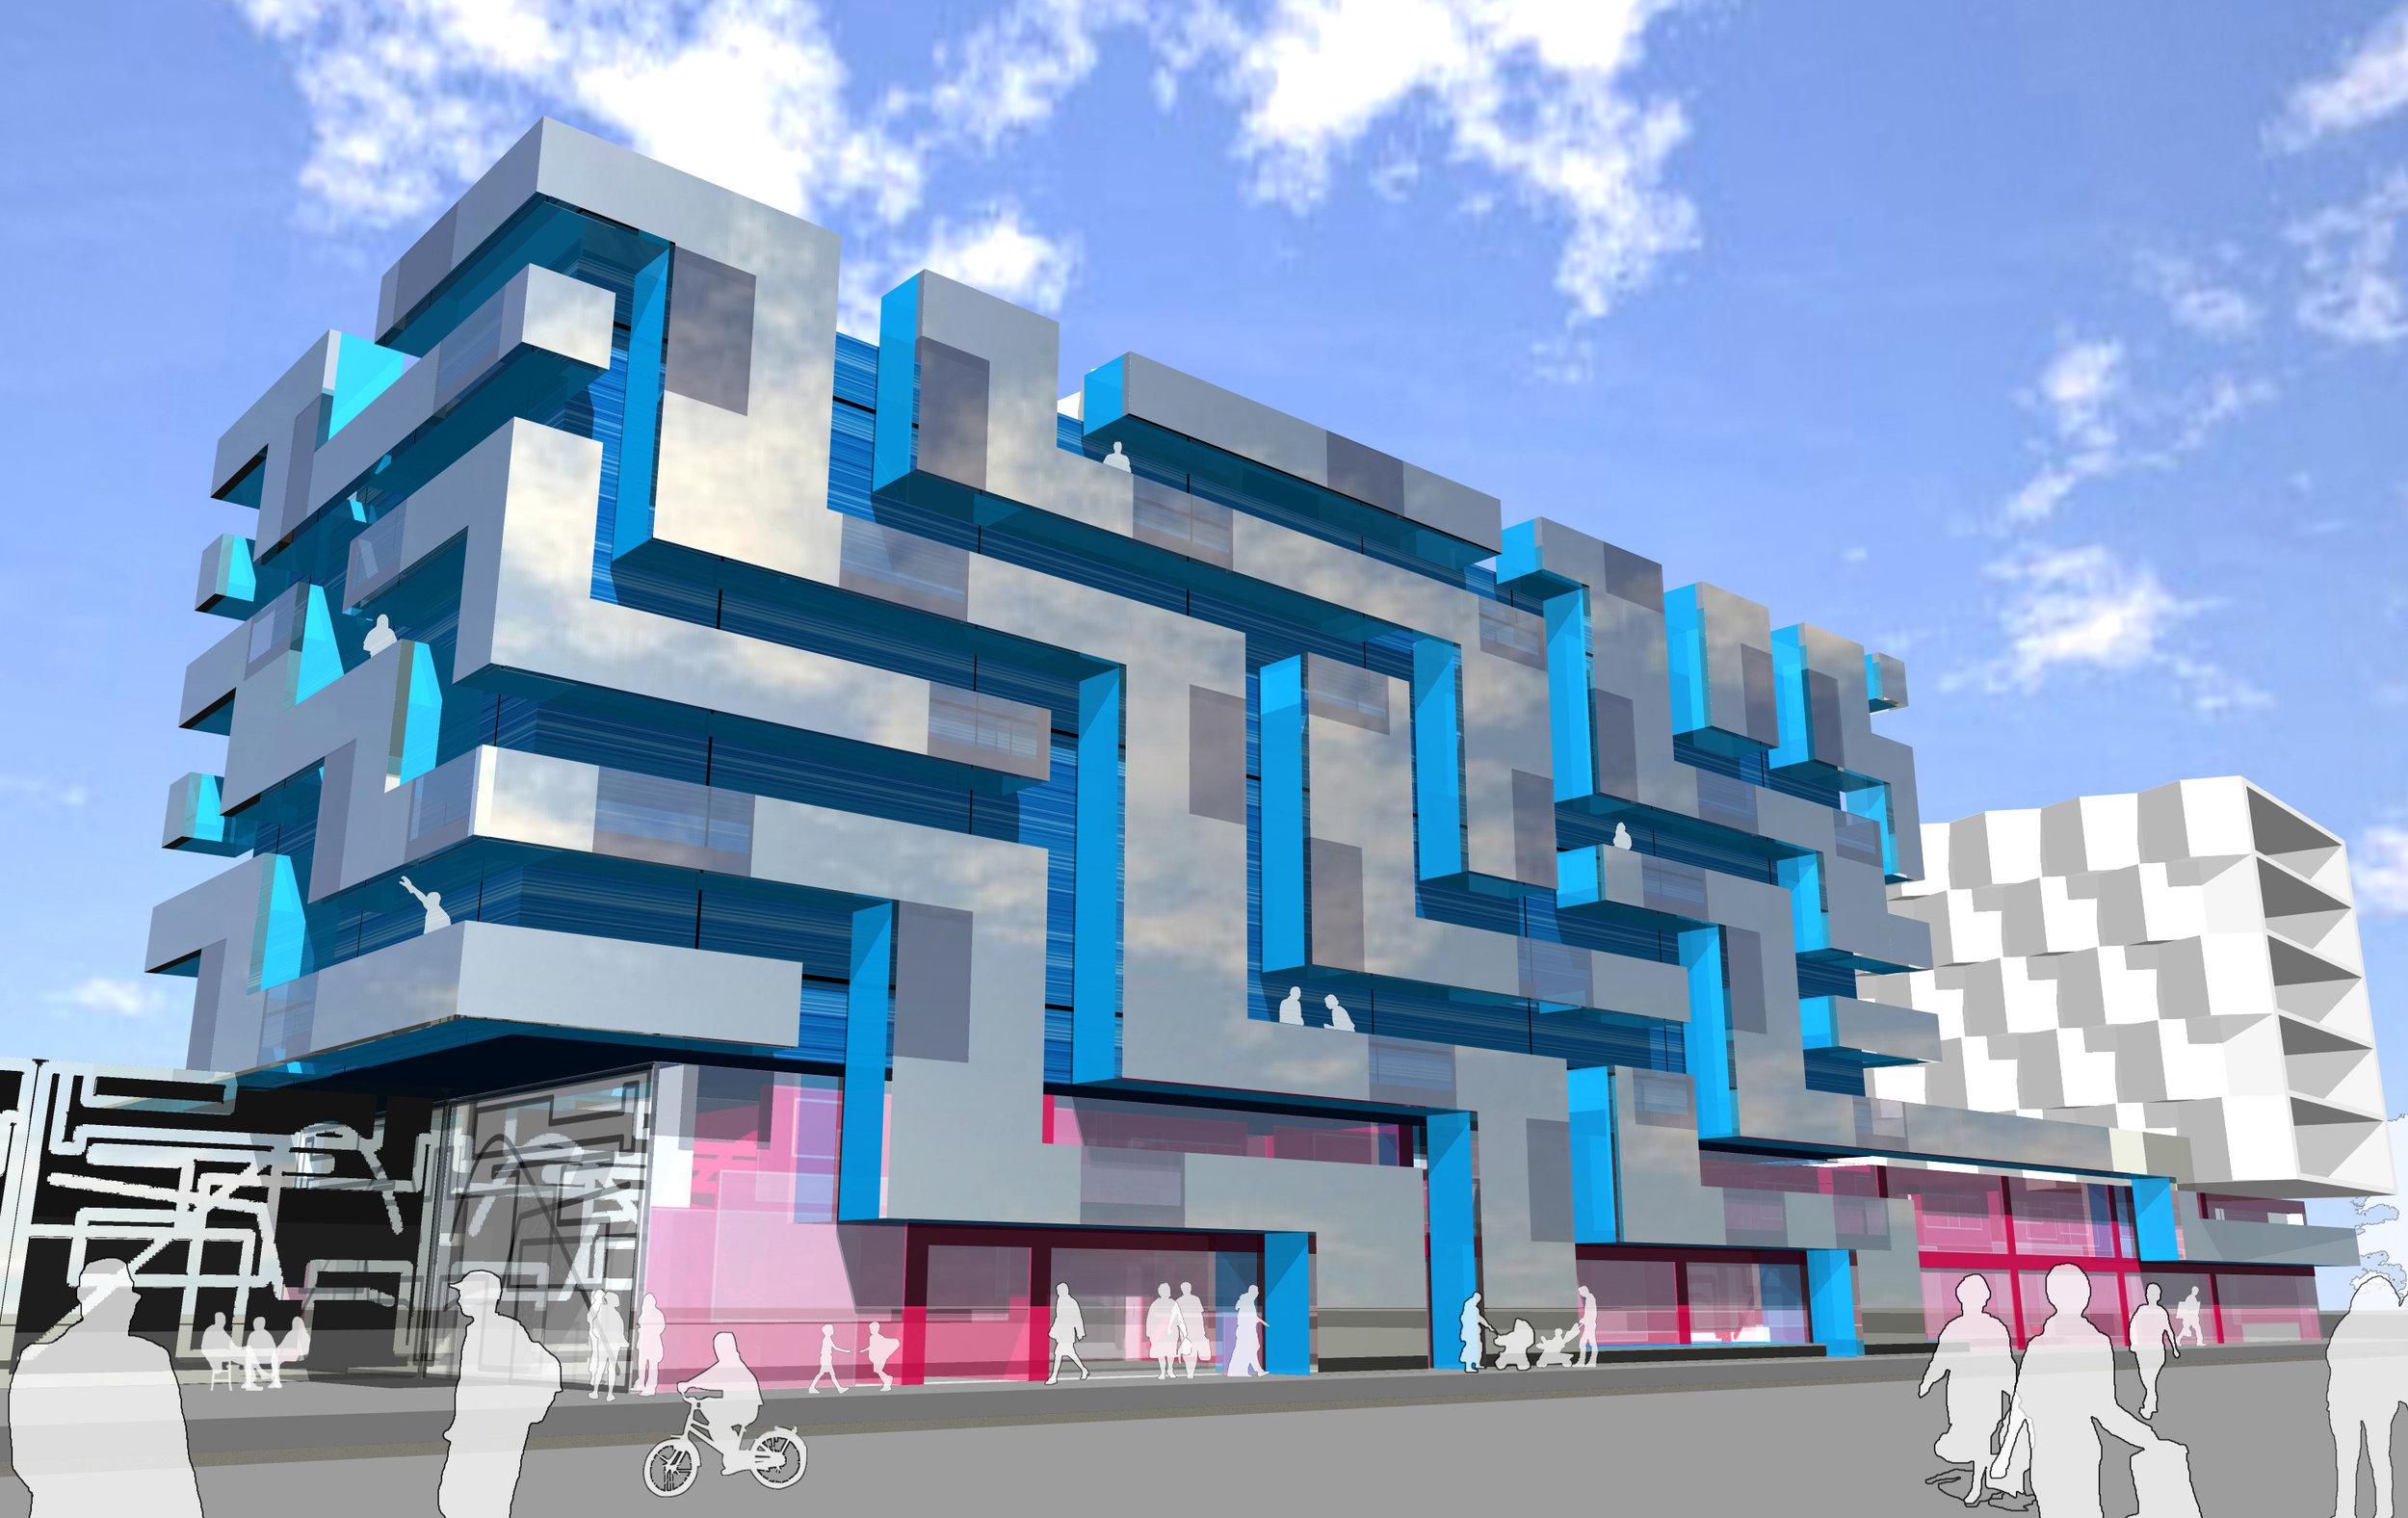 New Islington, Manchester